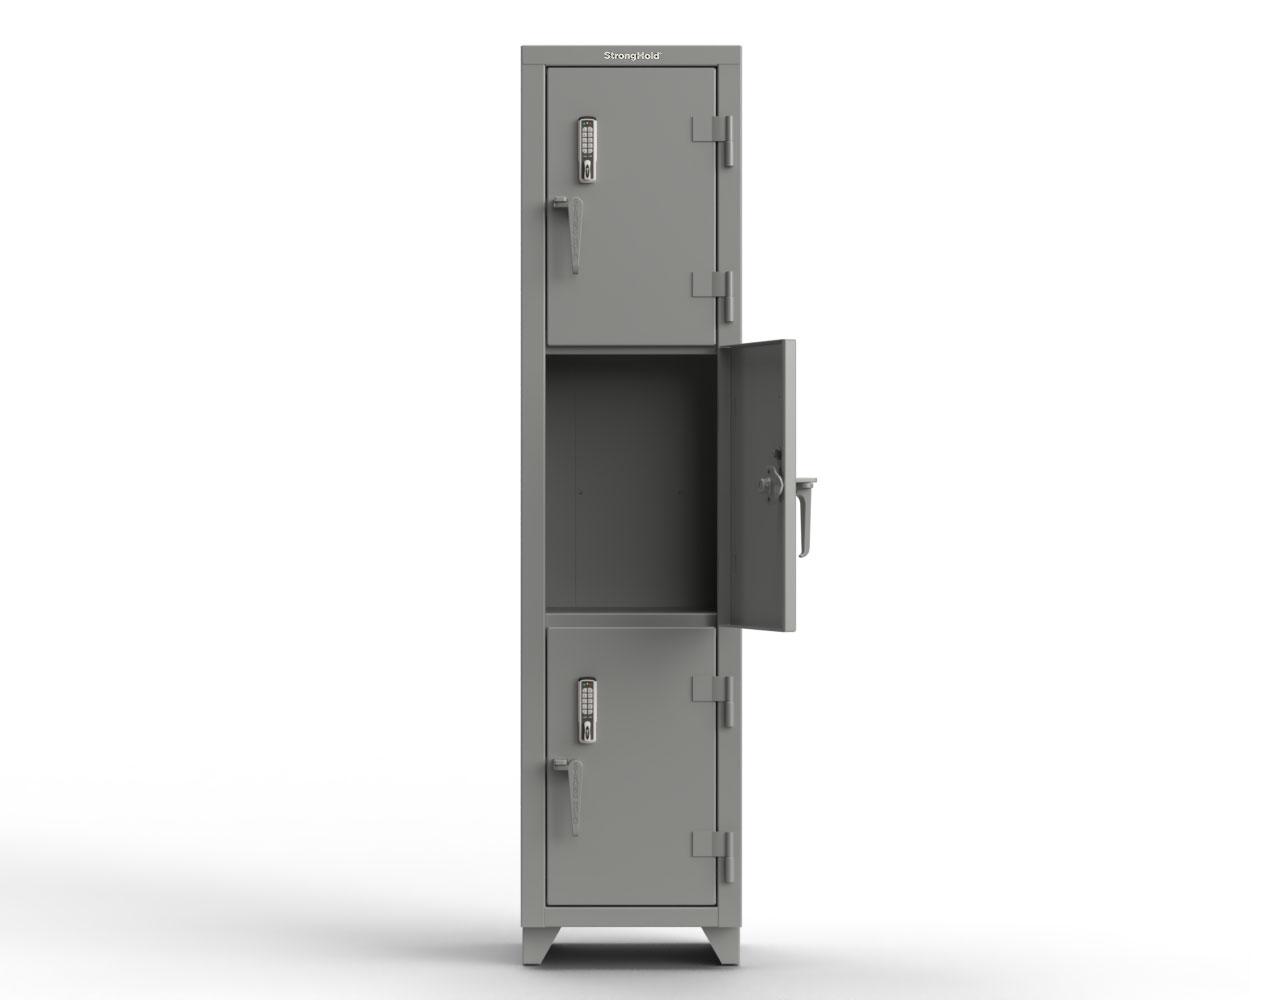 Extra Heavy Duty 14 GA Triple-Tier Locker with Keyless Entry Lock, 3 Compartments – 18 in. W x 18 in. D x 75 in. H